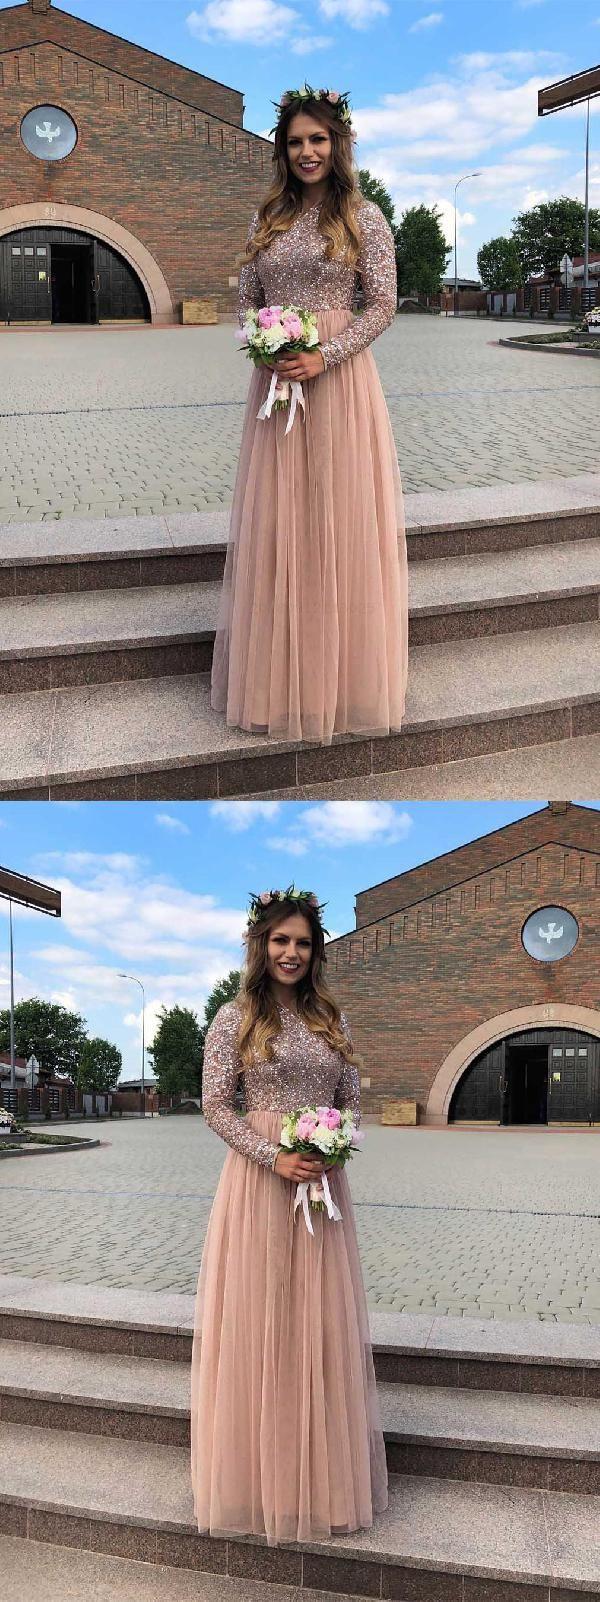 Discount Dazzling 2019 Bridesmaid Dress, Prom Dresses For Cheap, Modest Bridesmaid Dress, Bridesmaid Dress Plus Size 11